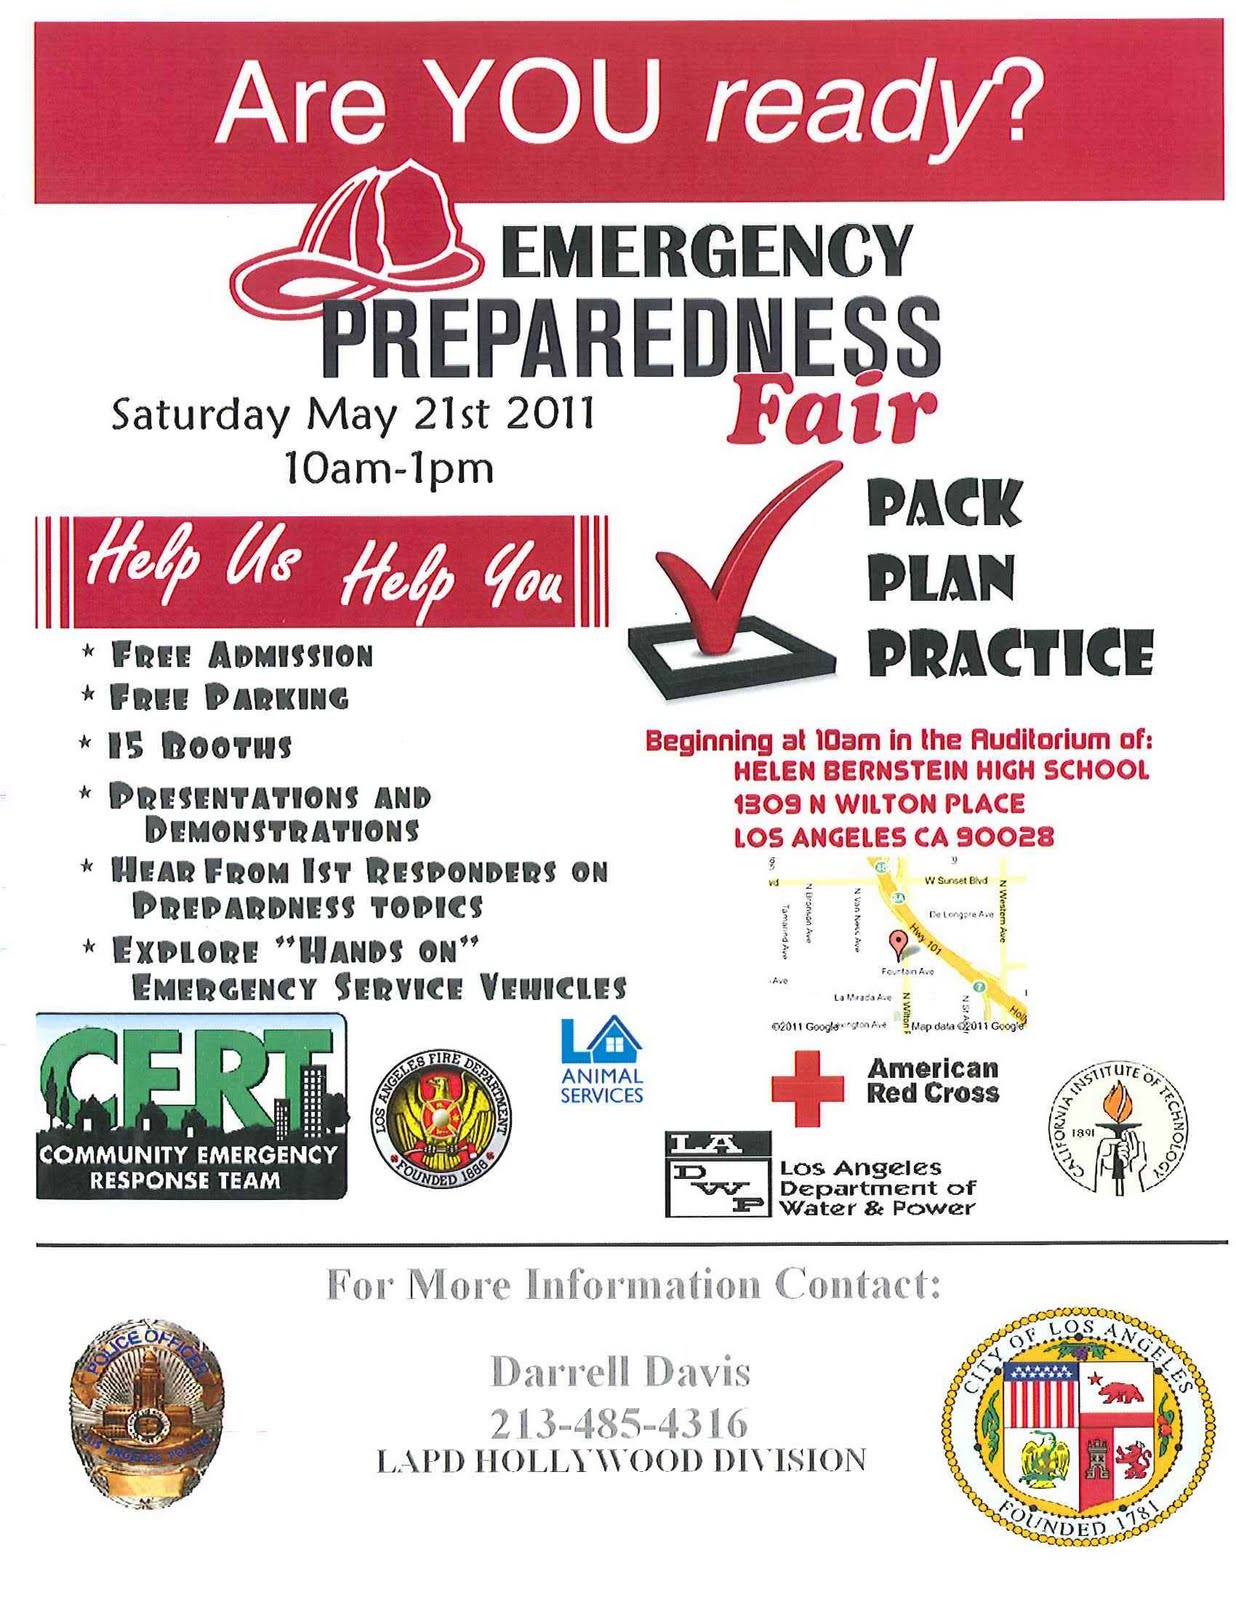 Pandemic Preparedness Plan Template  checklist http